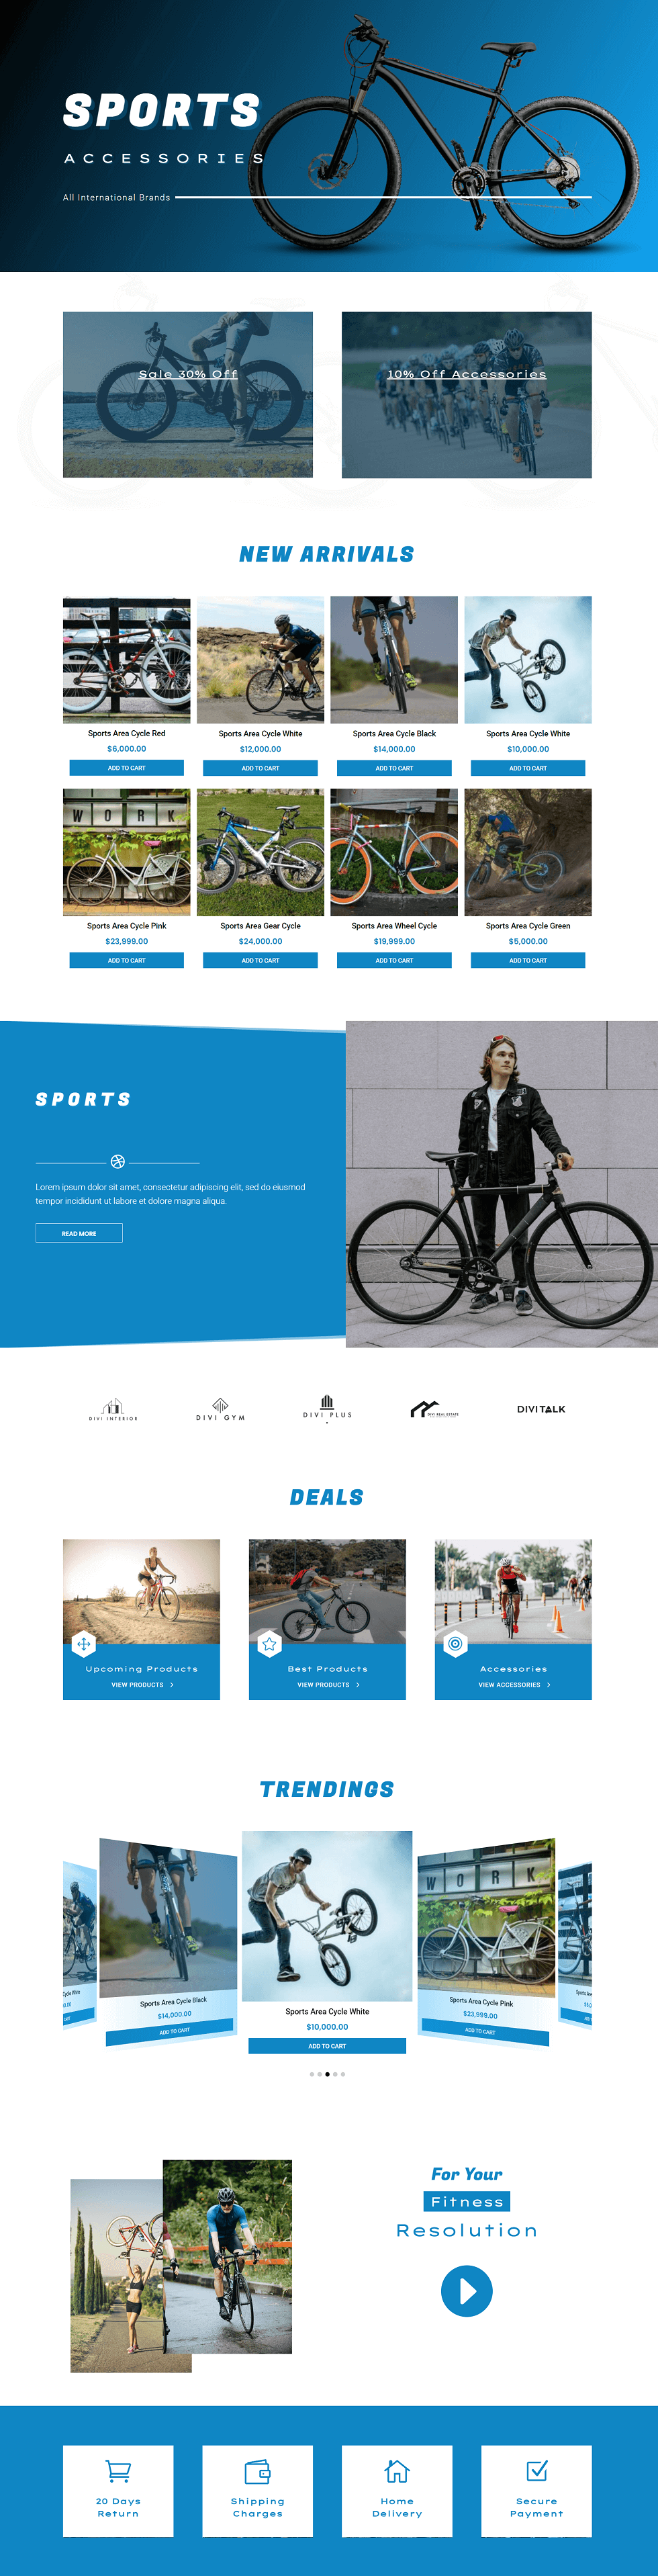 Divi Plus Cycle Store Image